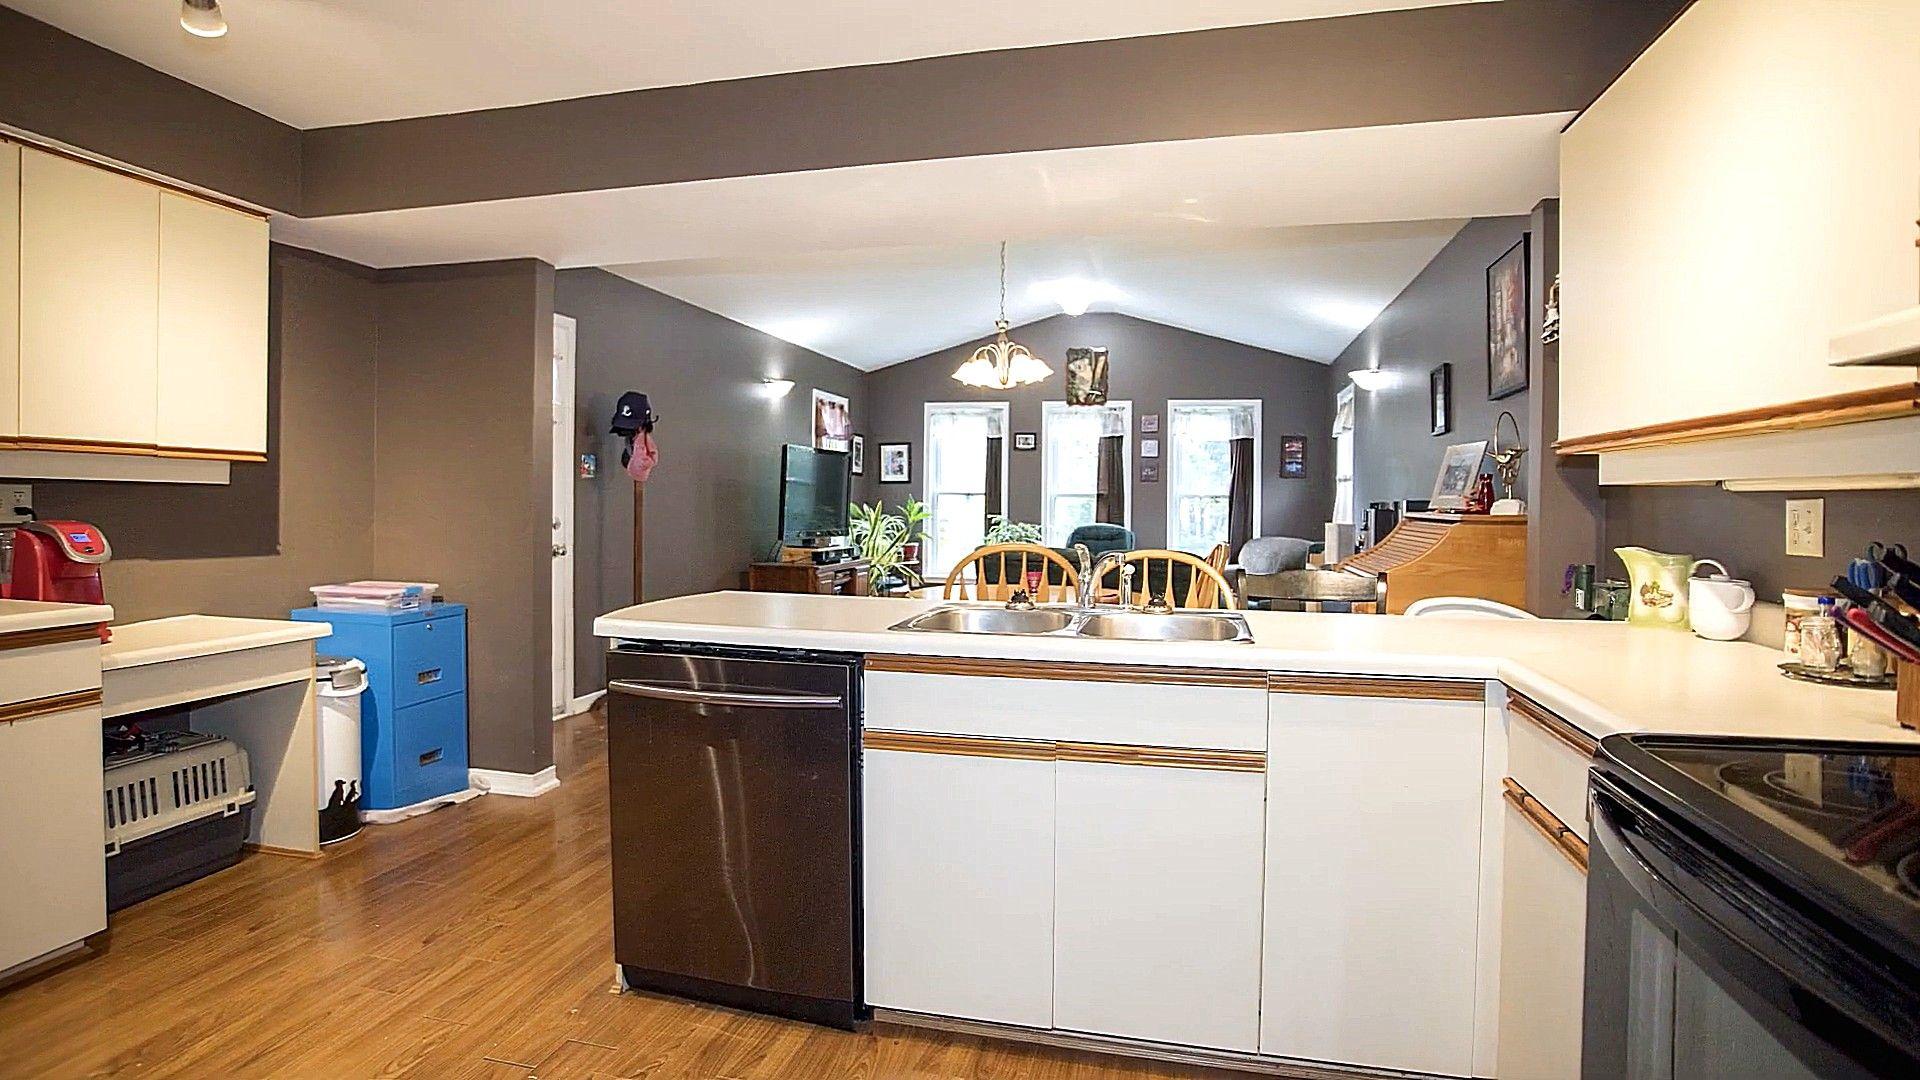 Kitchen Design Open Concept To Family Room Design Ideas